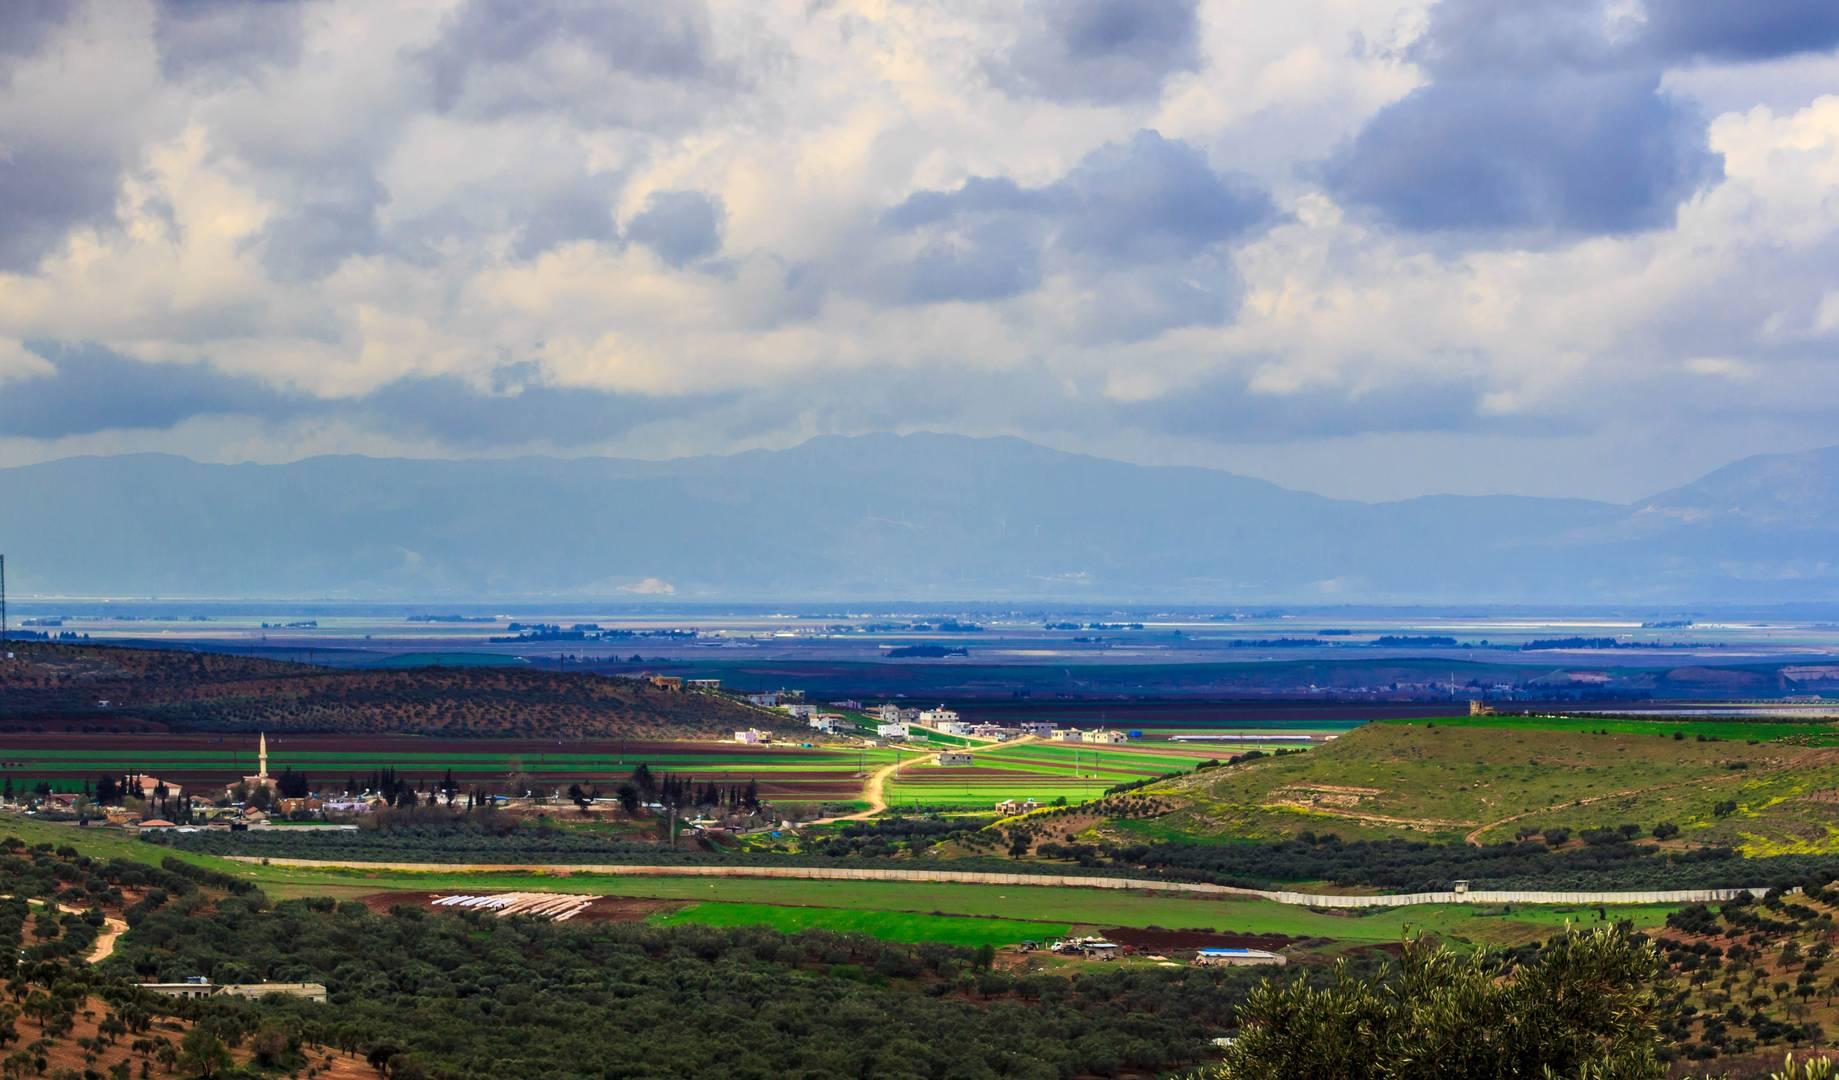 Сирийско-турецкая граница, вид из провинции Идлиб (Фото — Samer Daboul)